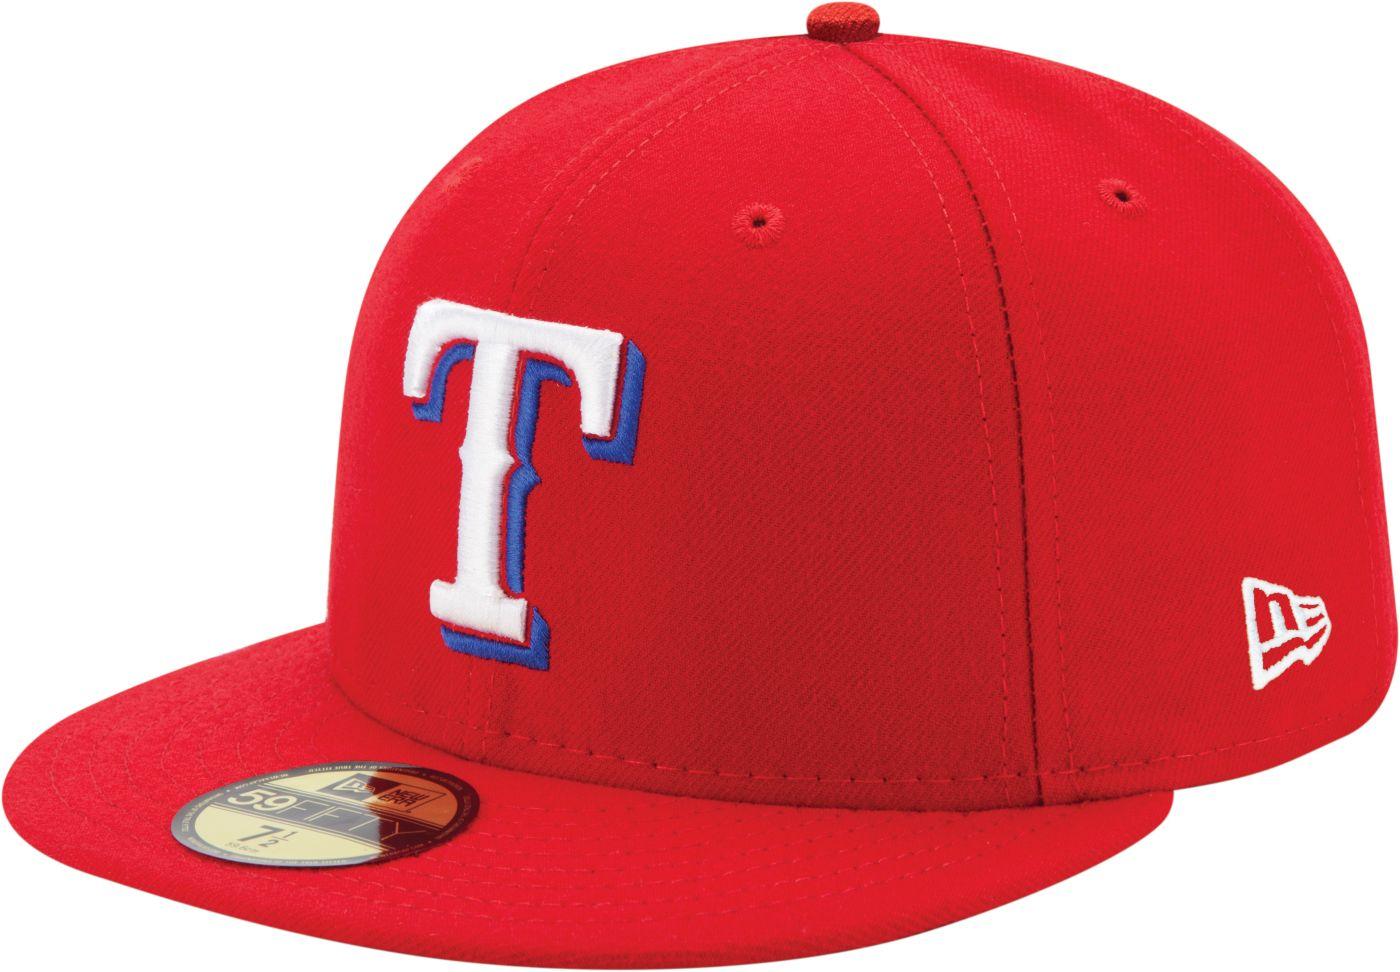 New Era Men's Texas Rangers 59Fifty Alternate Red Authentic Hat